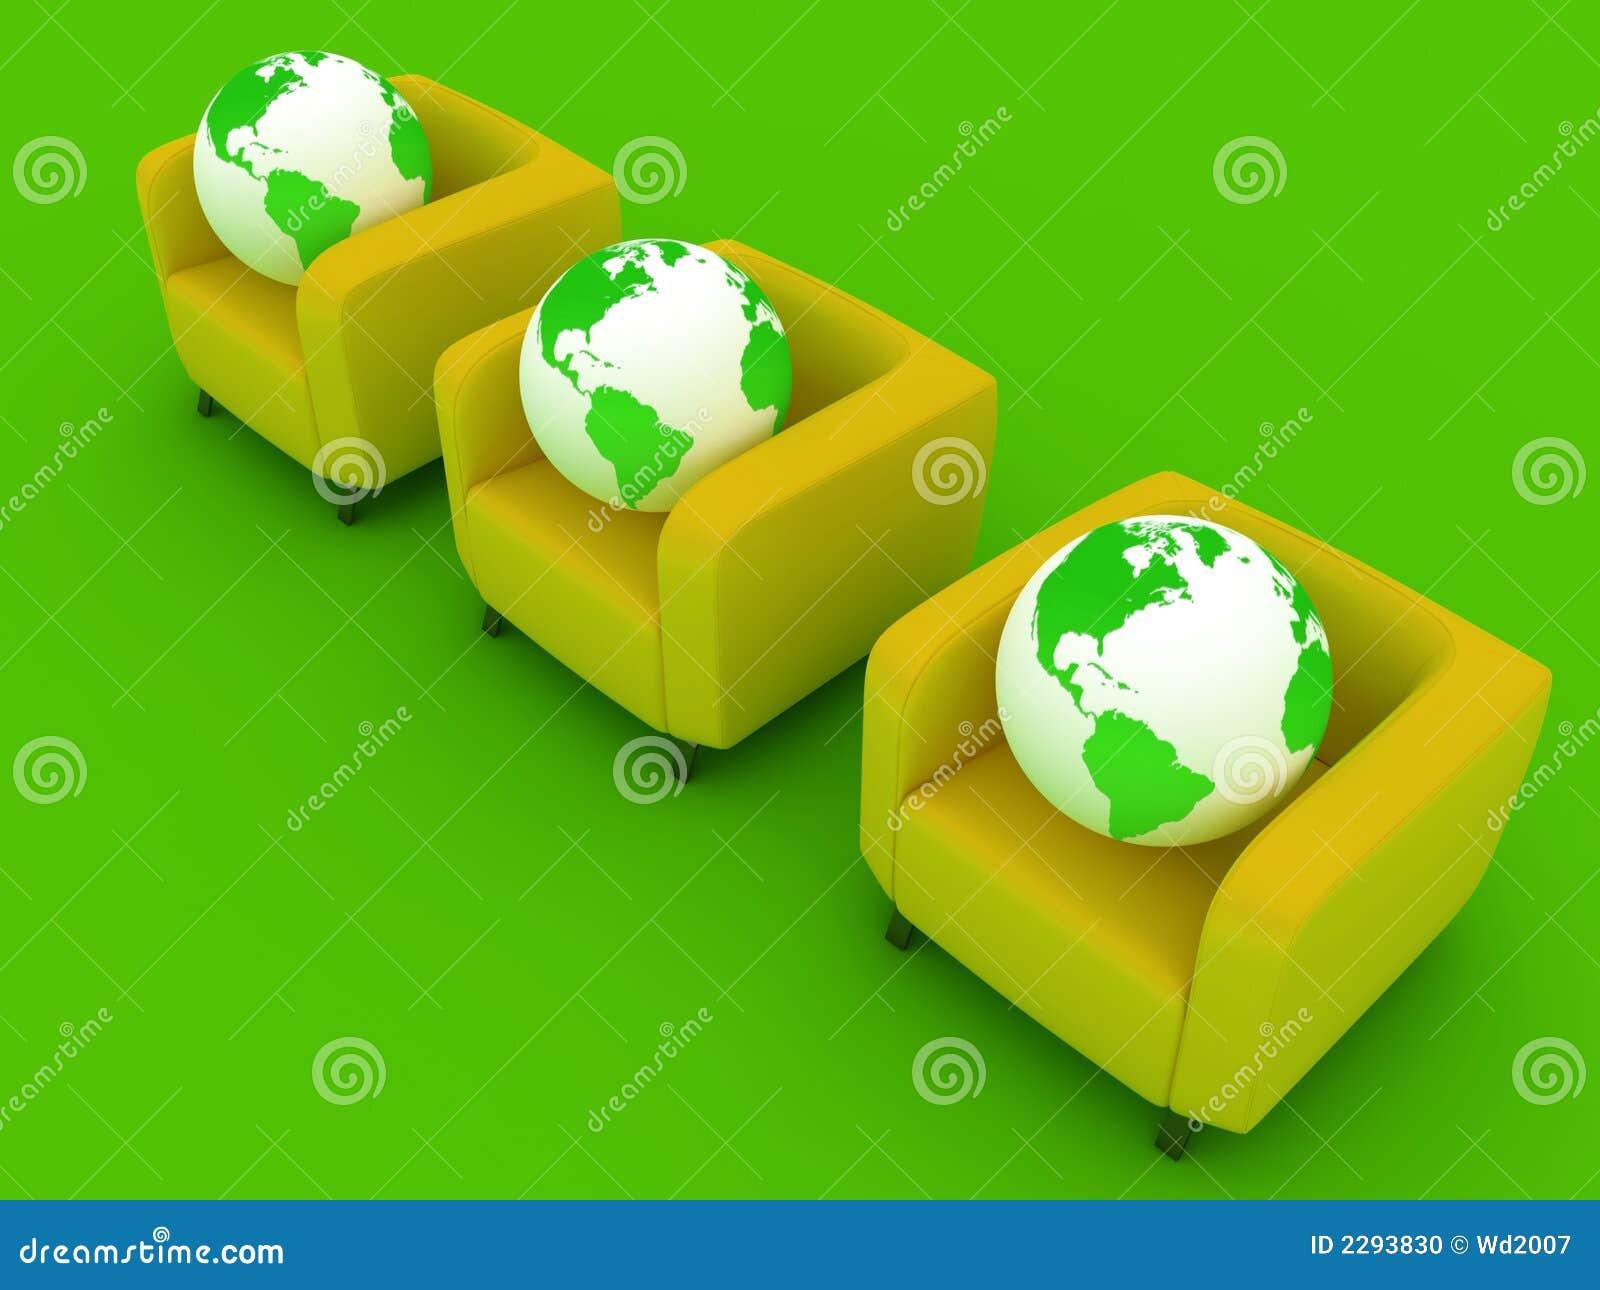 Three green Globes and sofa